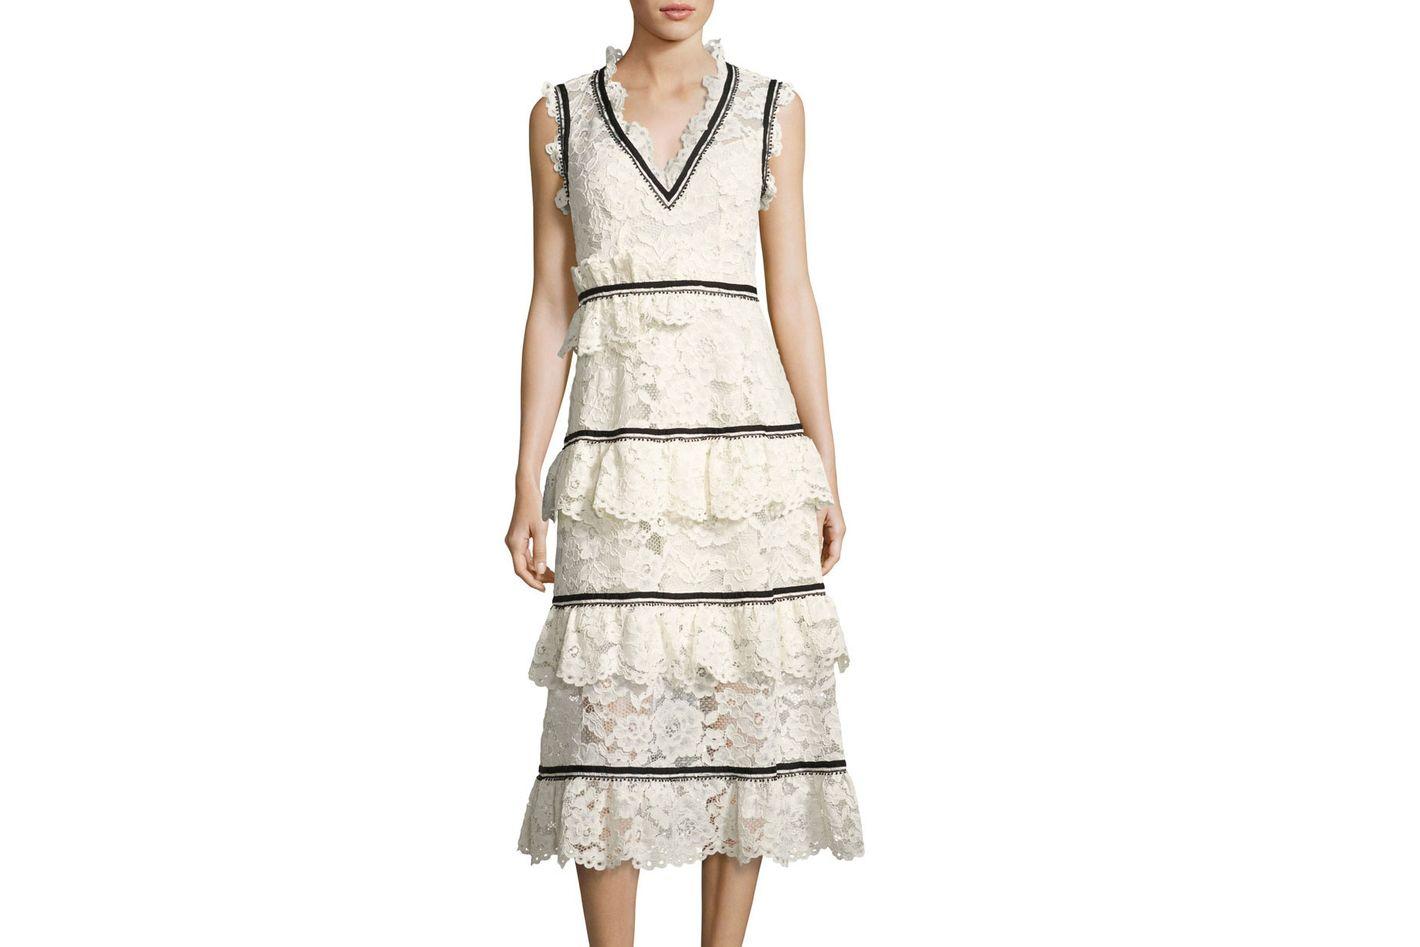 Self-Portrait Tiered Lace Sleeveless Midi Dress, White/Black